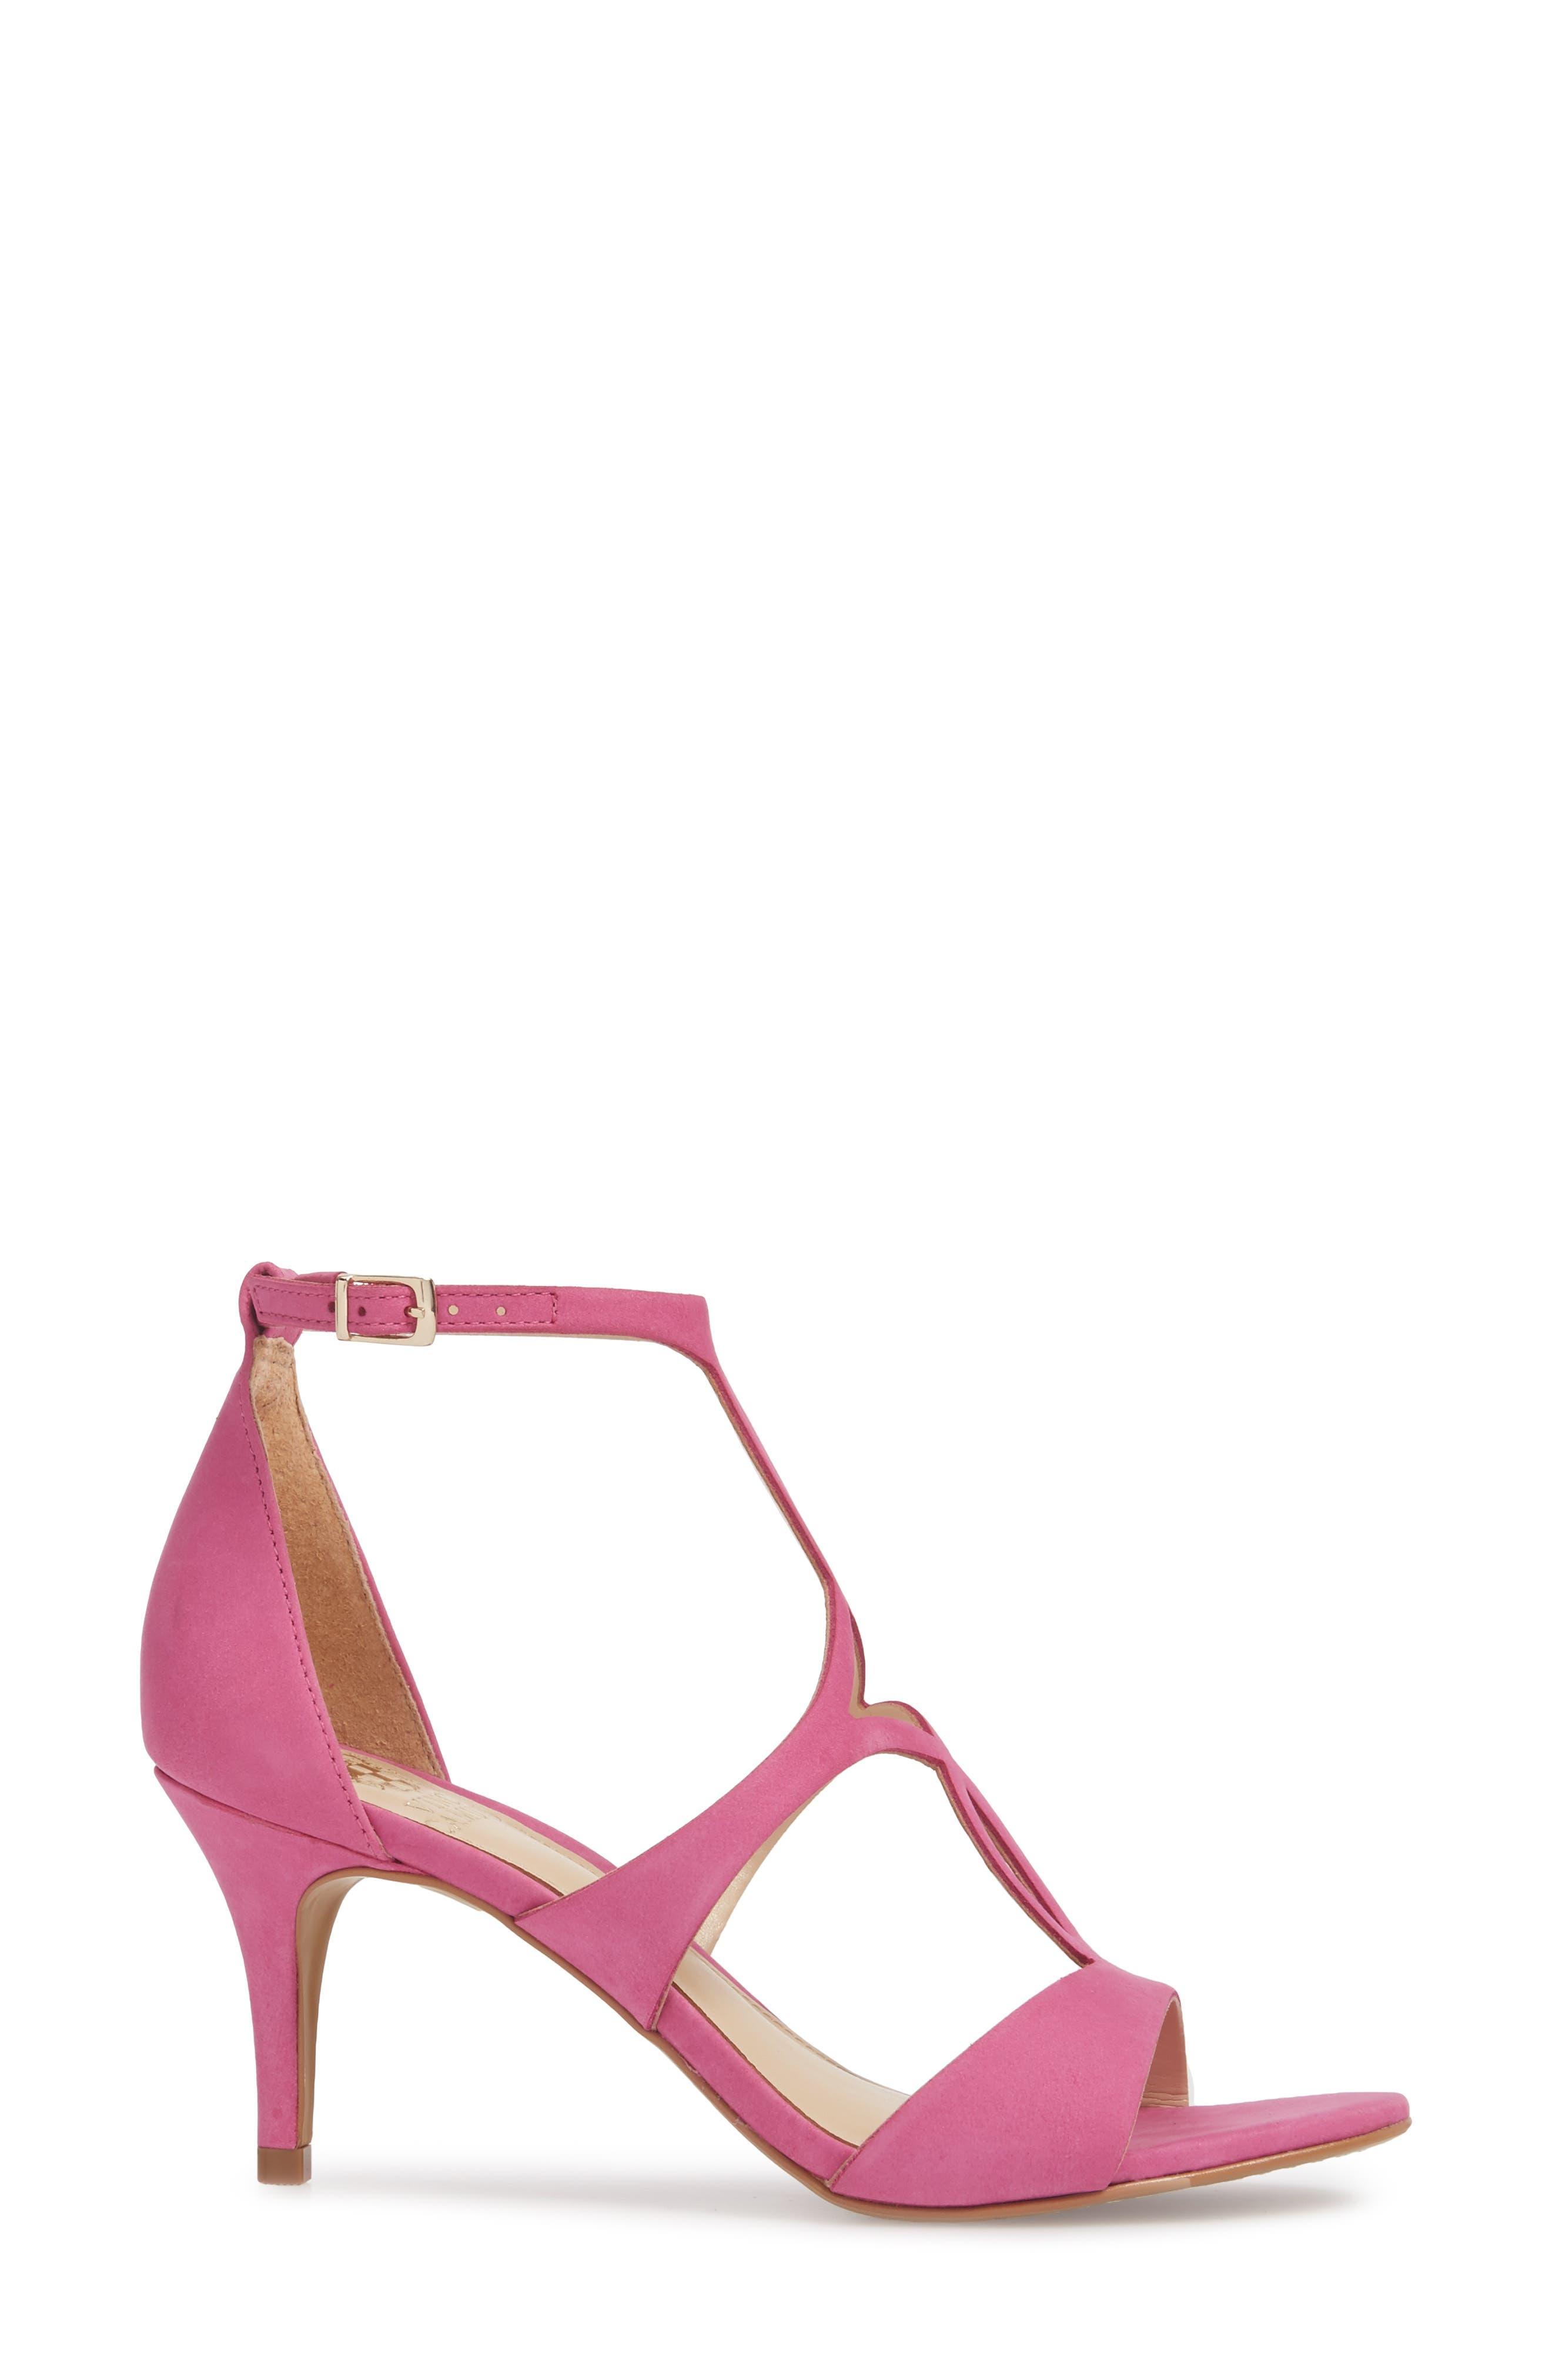 Payto Sandal,                             Alternate thumbnail 3, color,                             Pink Leather